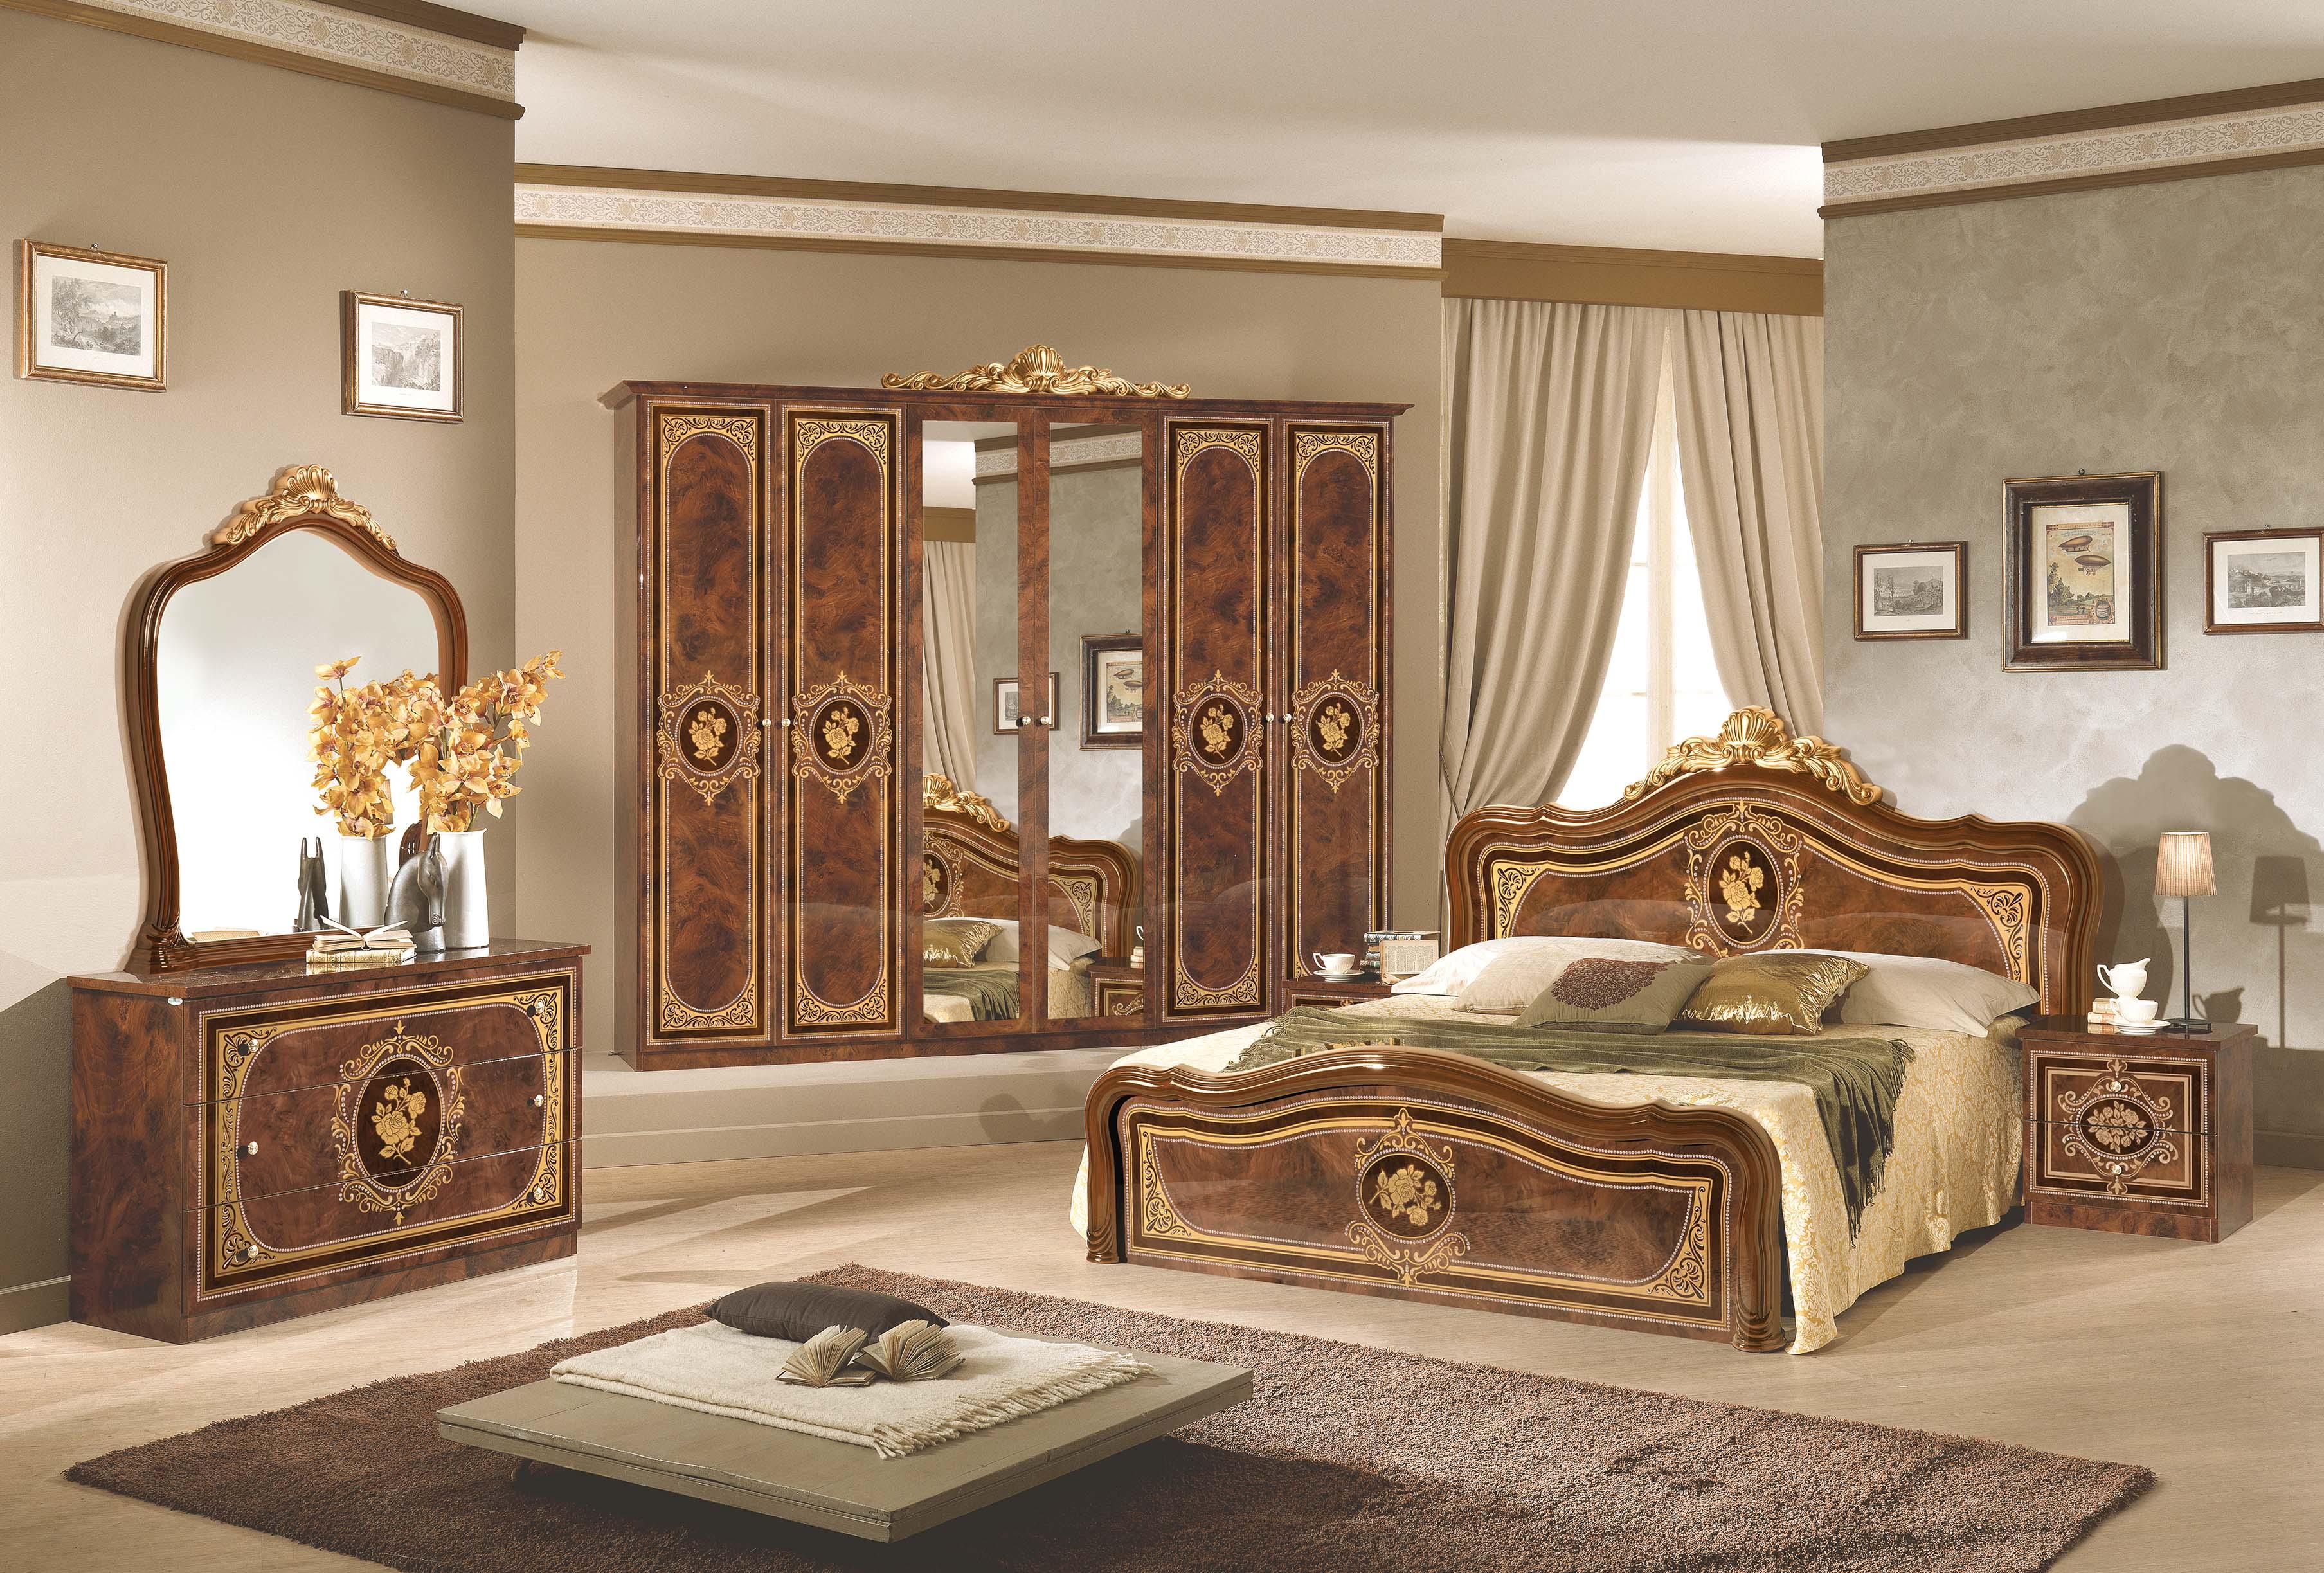 Schlafzimmer Alice in creme beige Barock 160x200cm-XP_PFALCCA4A